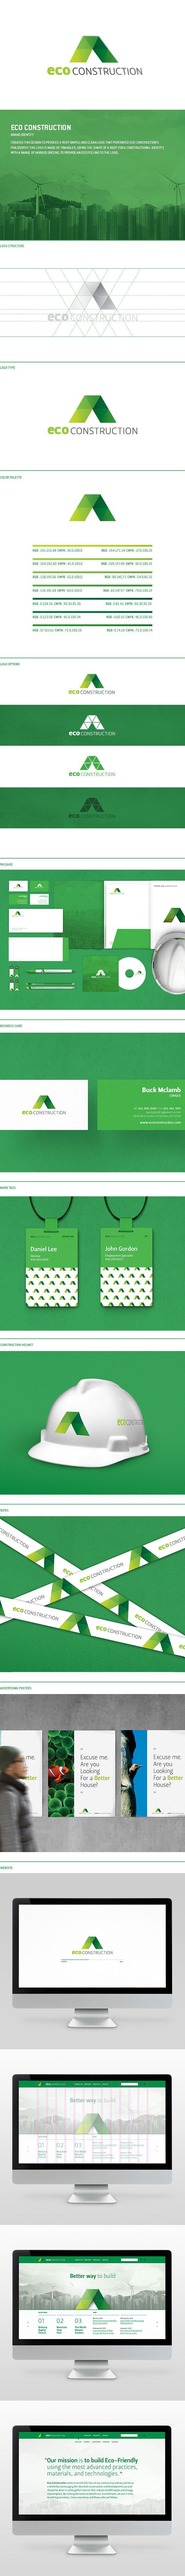 Eco Construction by Jasung Gu, via Behance #branding #graphicdesign